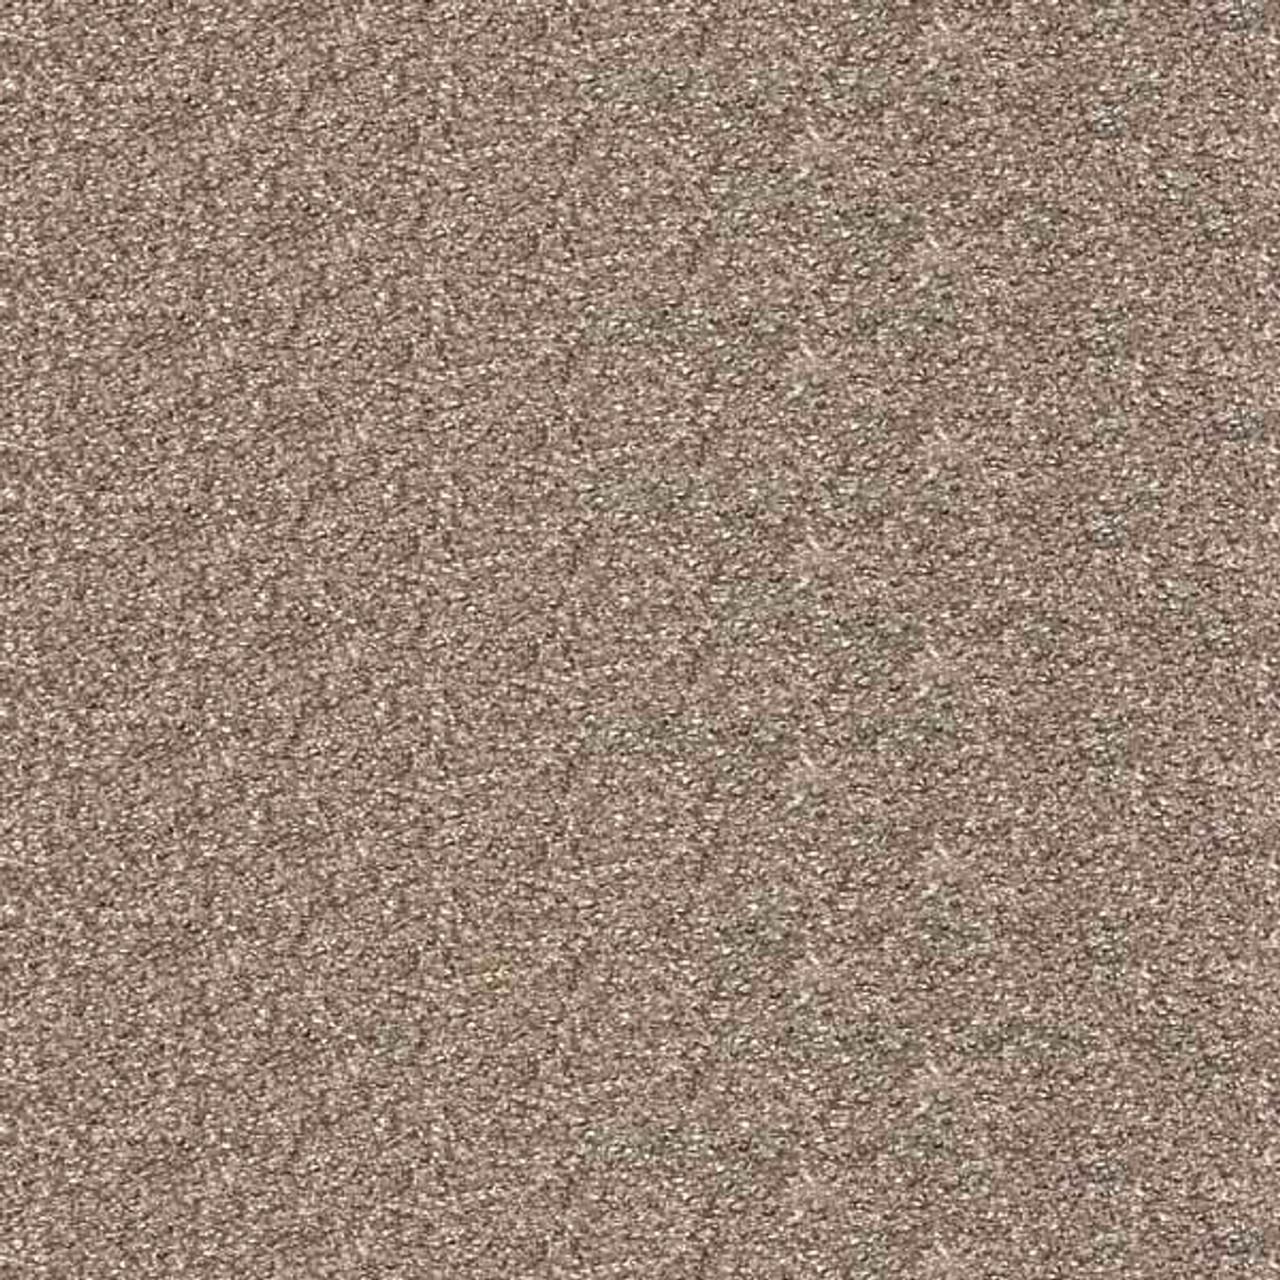 Bostik Bostik Dimension Reflective Grout Hematite